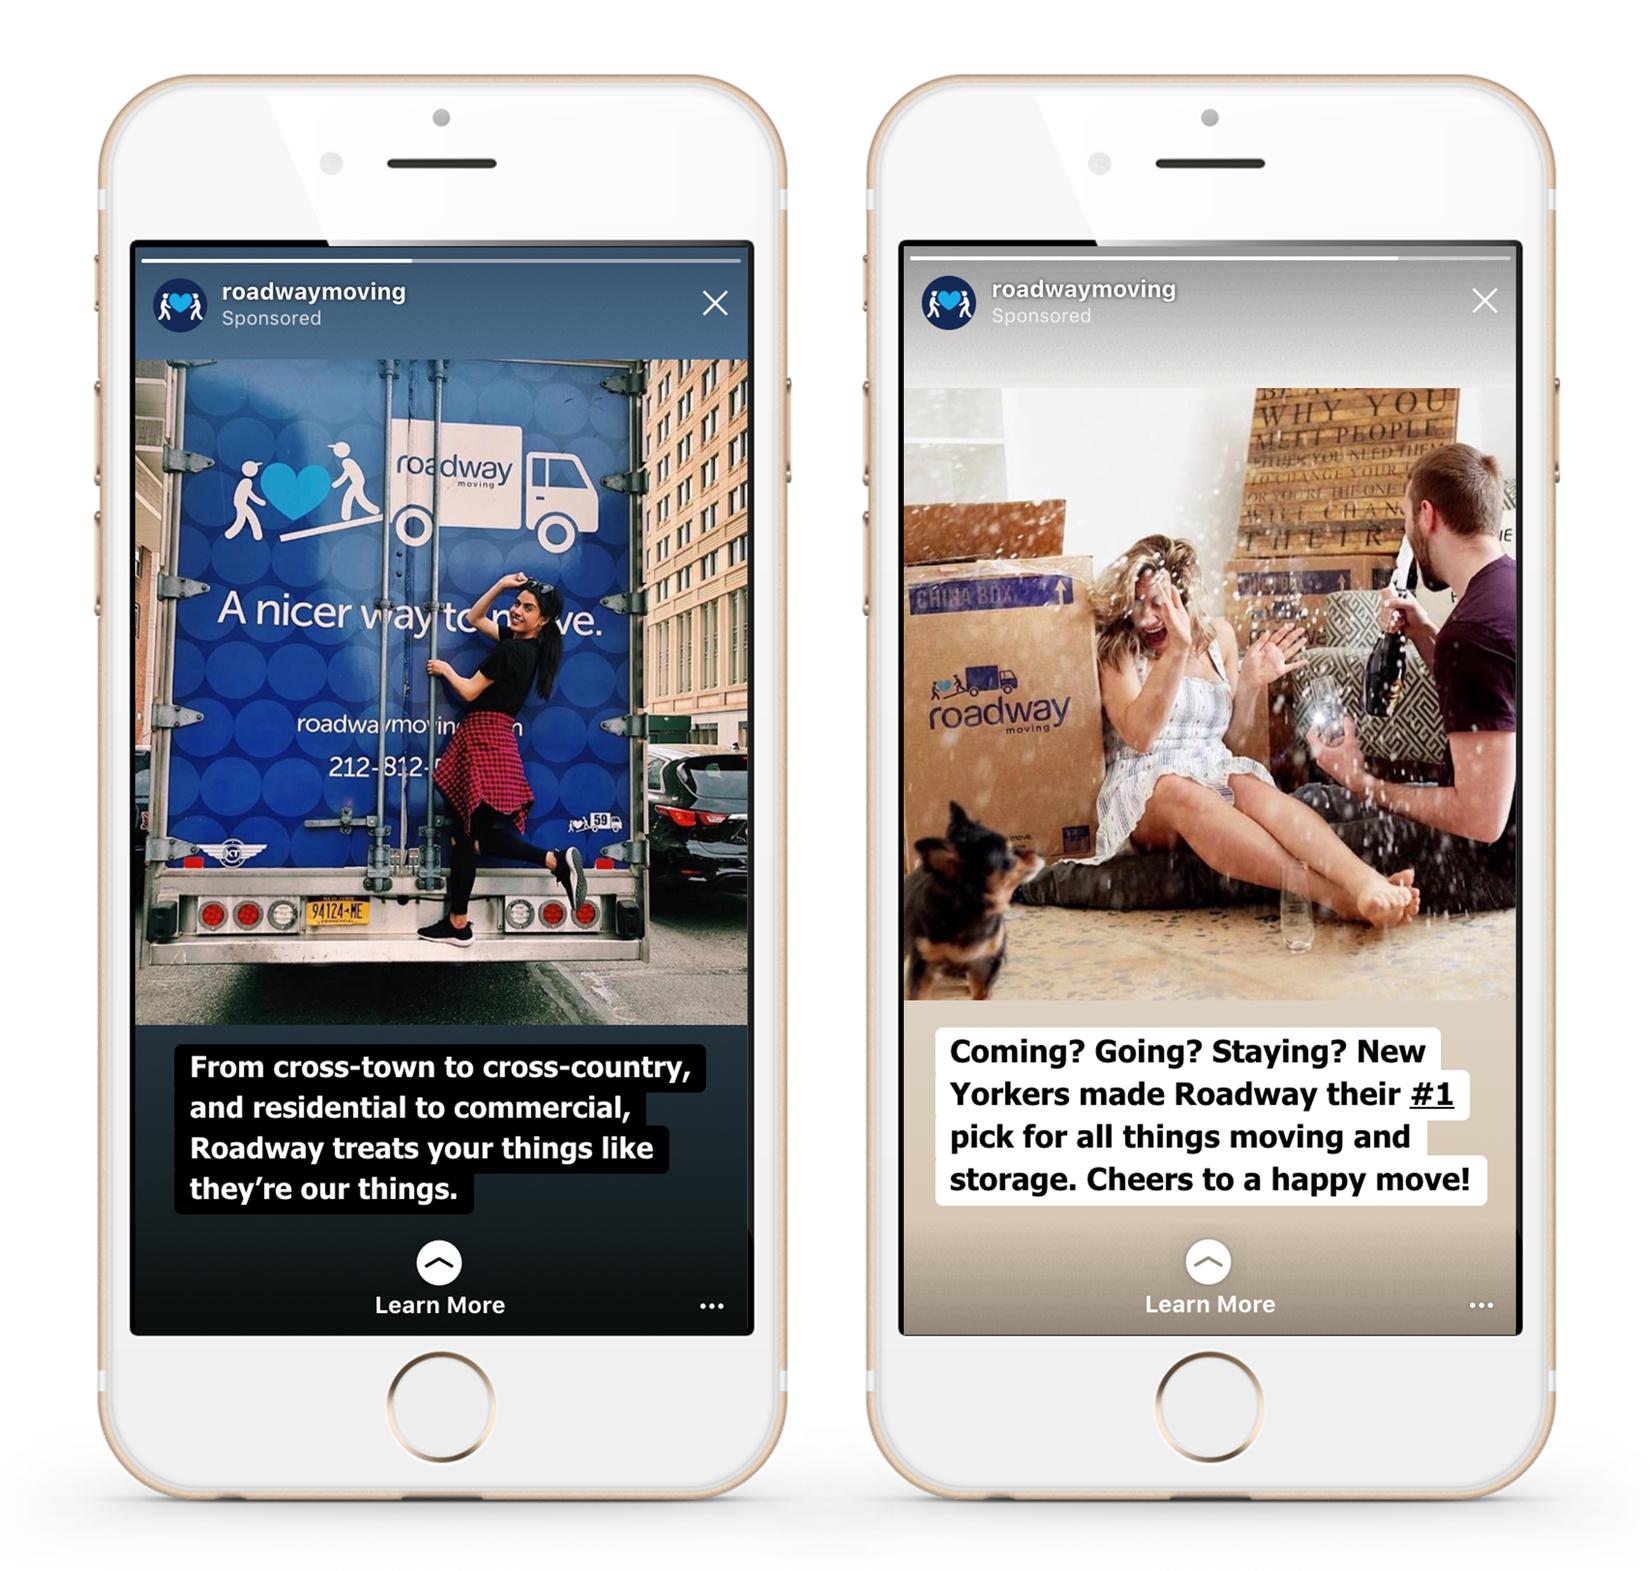 OurWork-Social-Media-Roadway.jpg